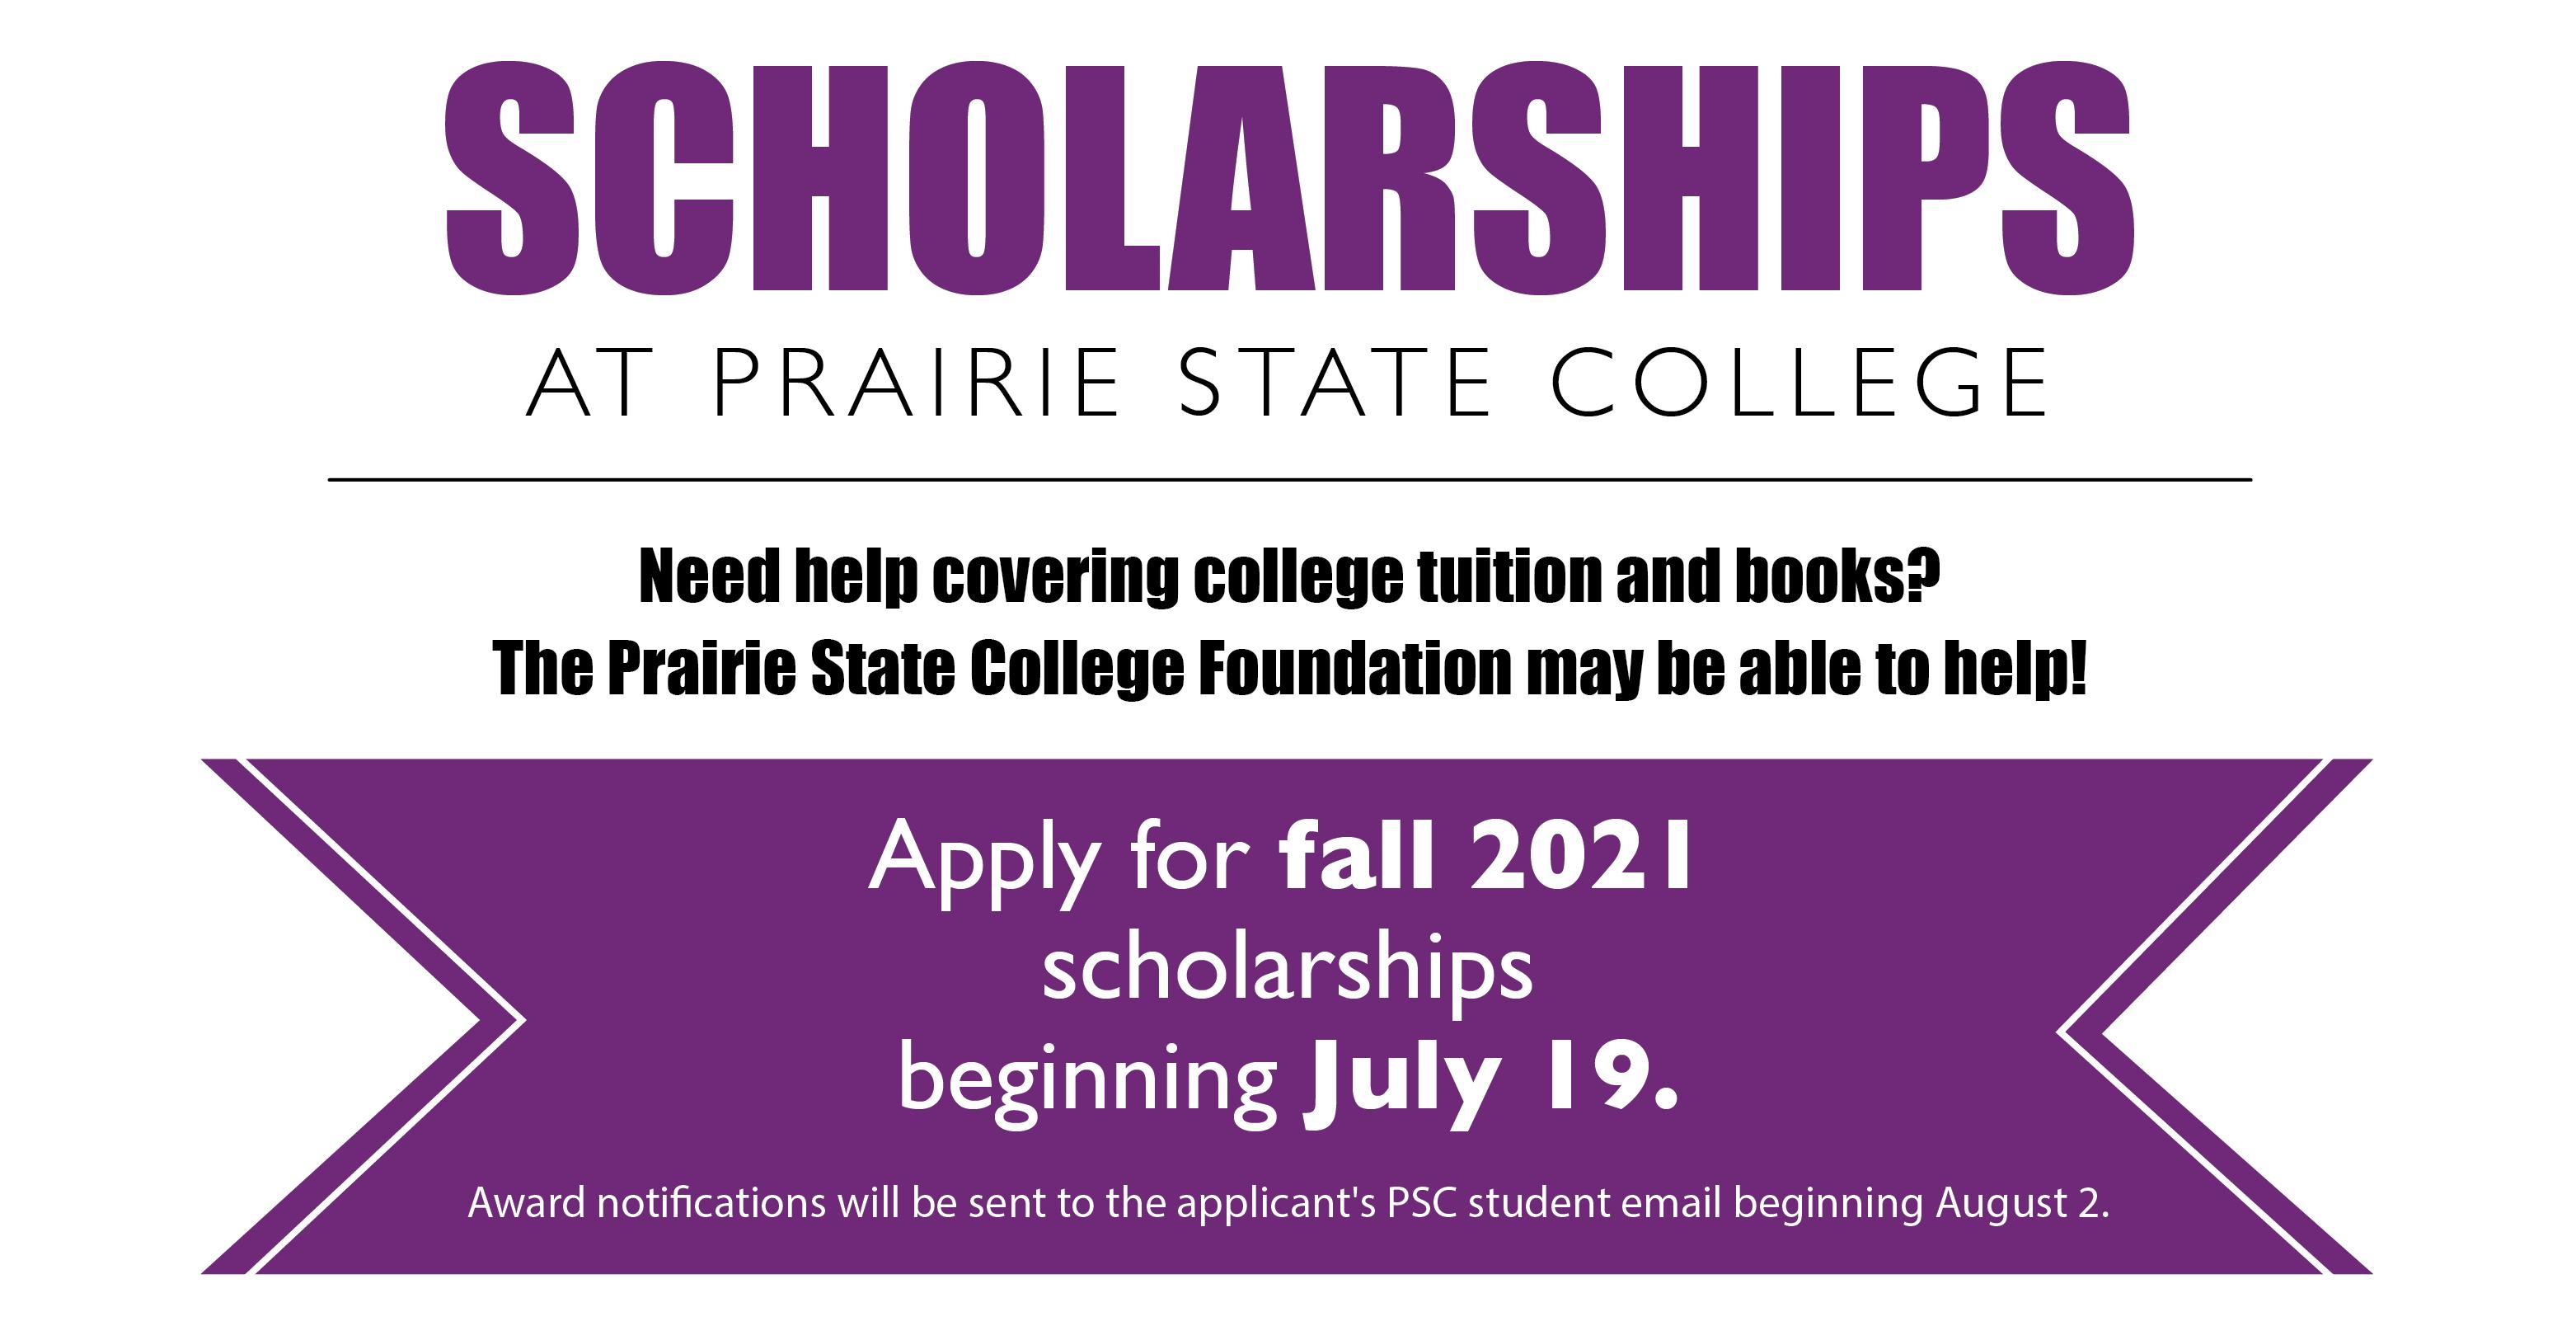 Apply for Fall 2021 scholarships beginning July 19.